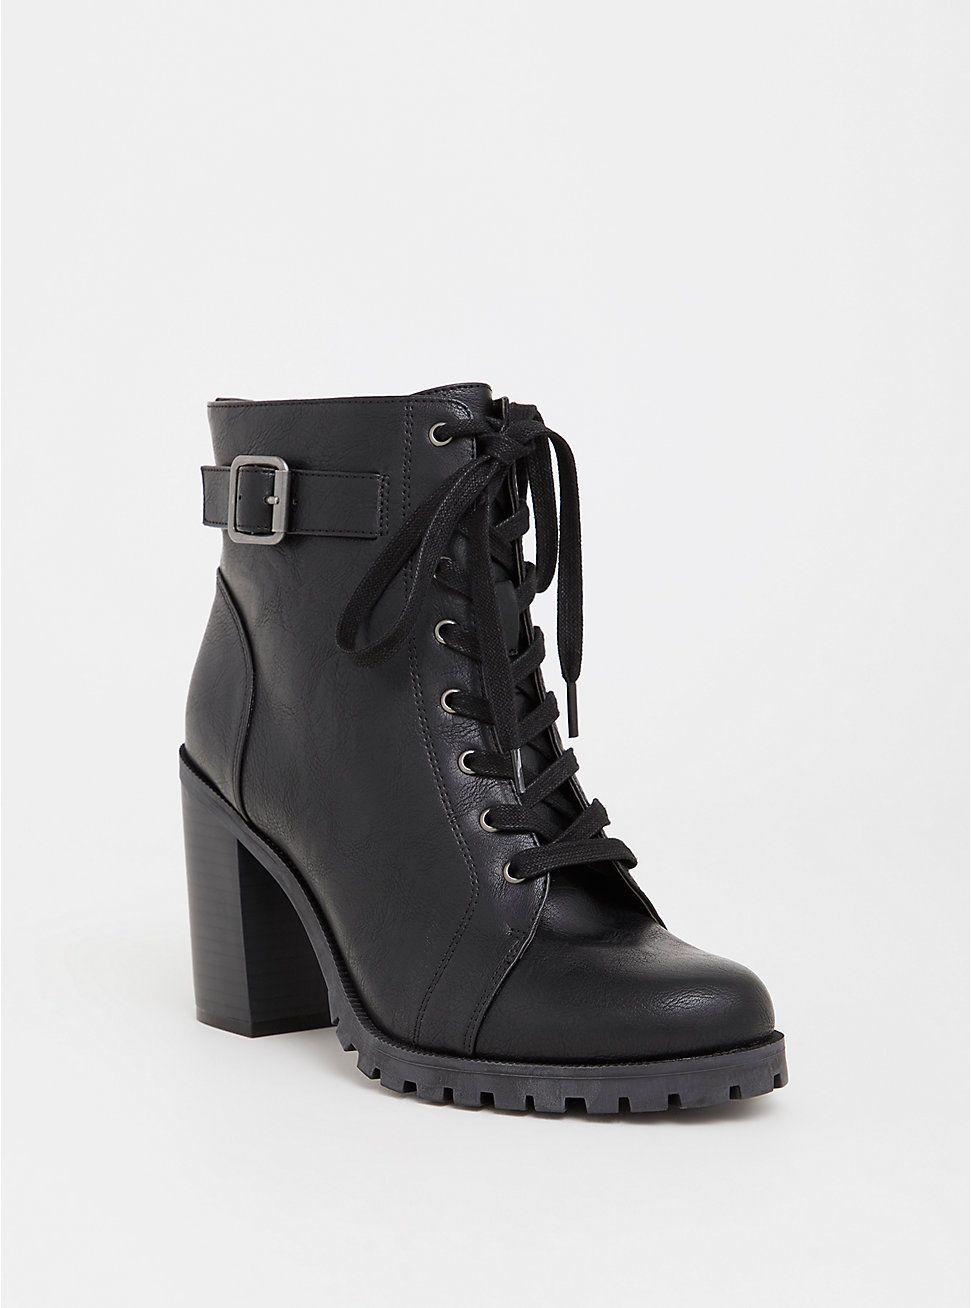 Black faux leather combat boot wide width combat boots